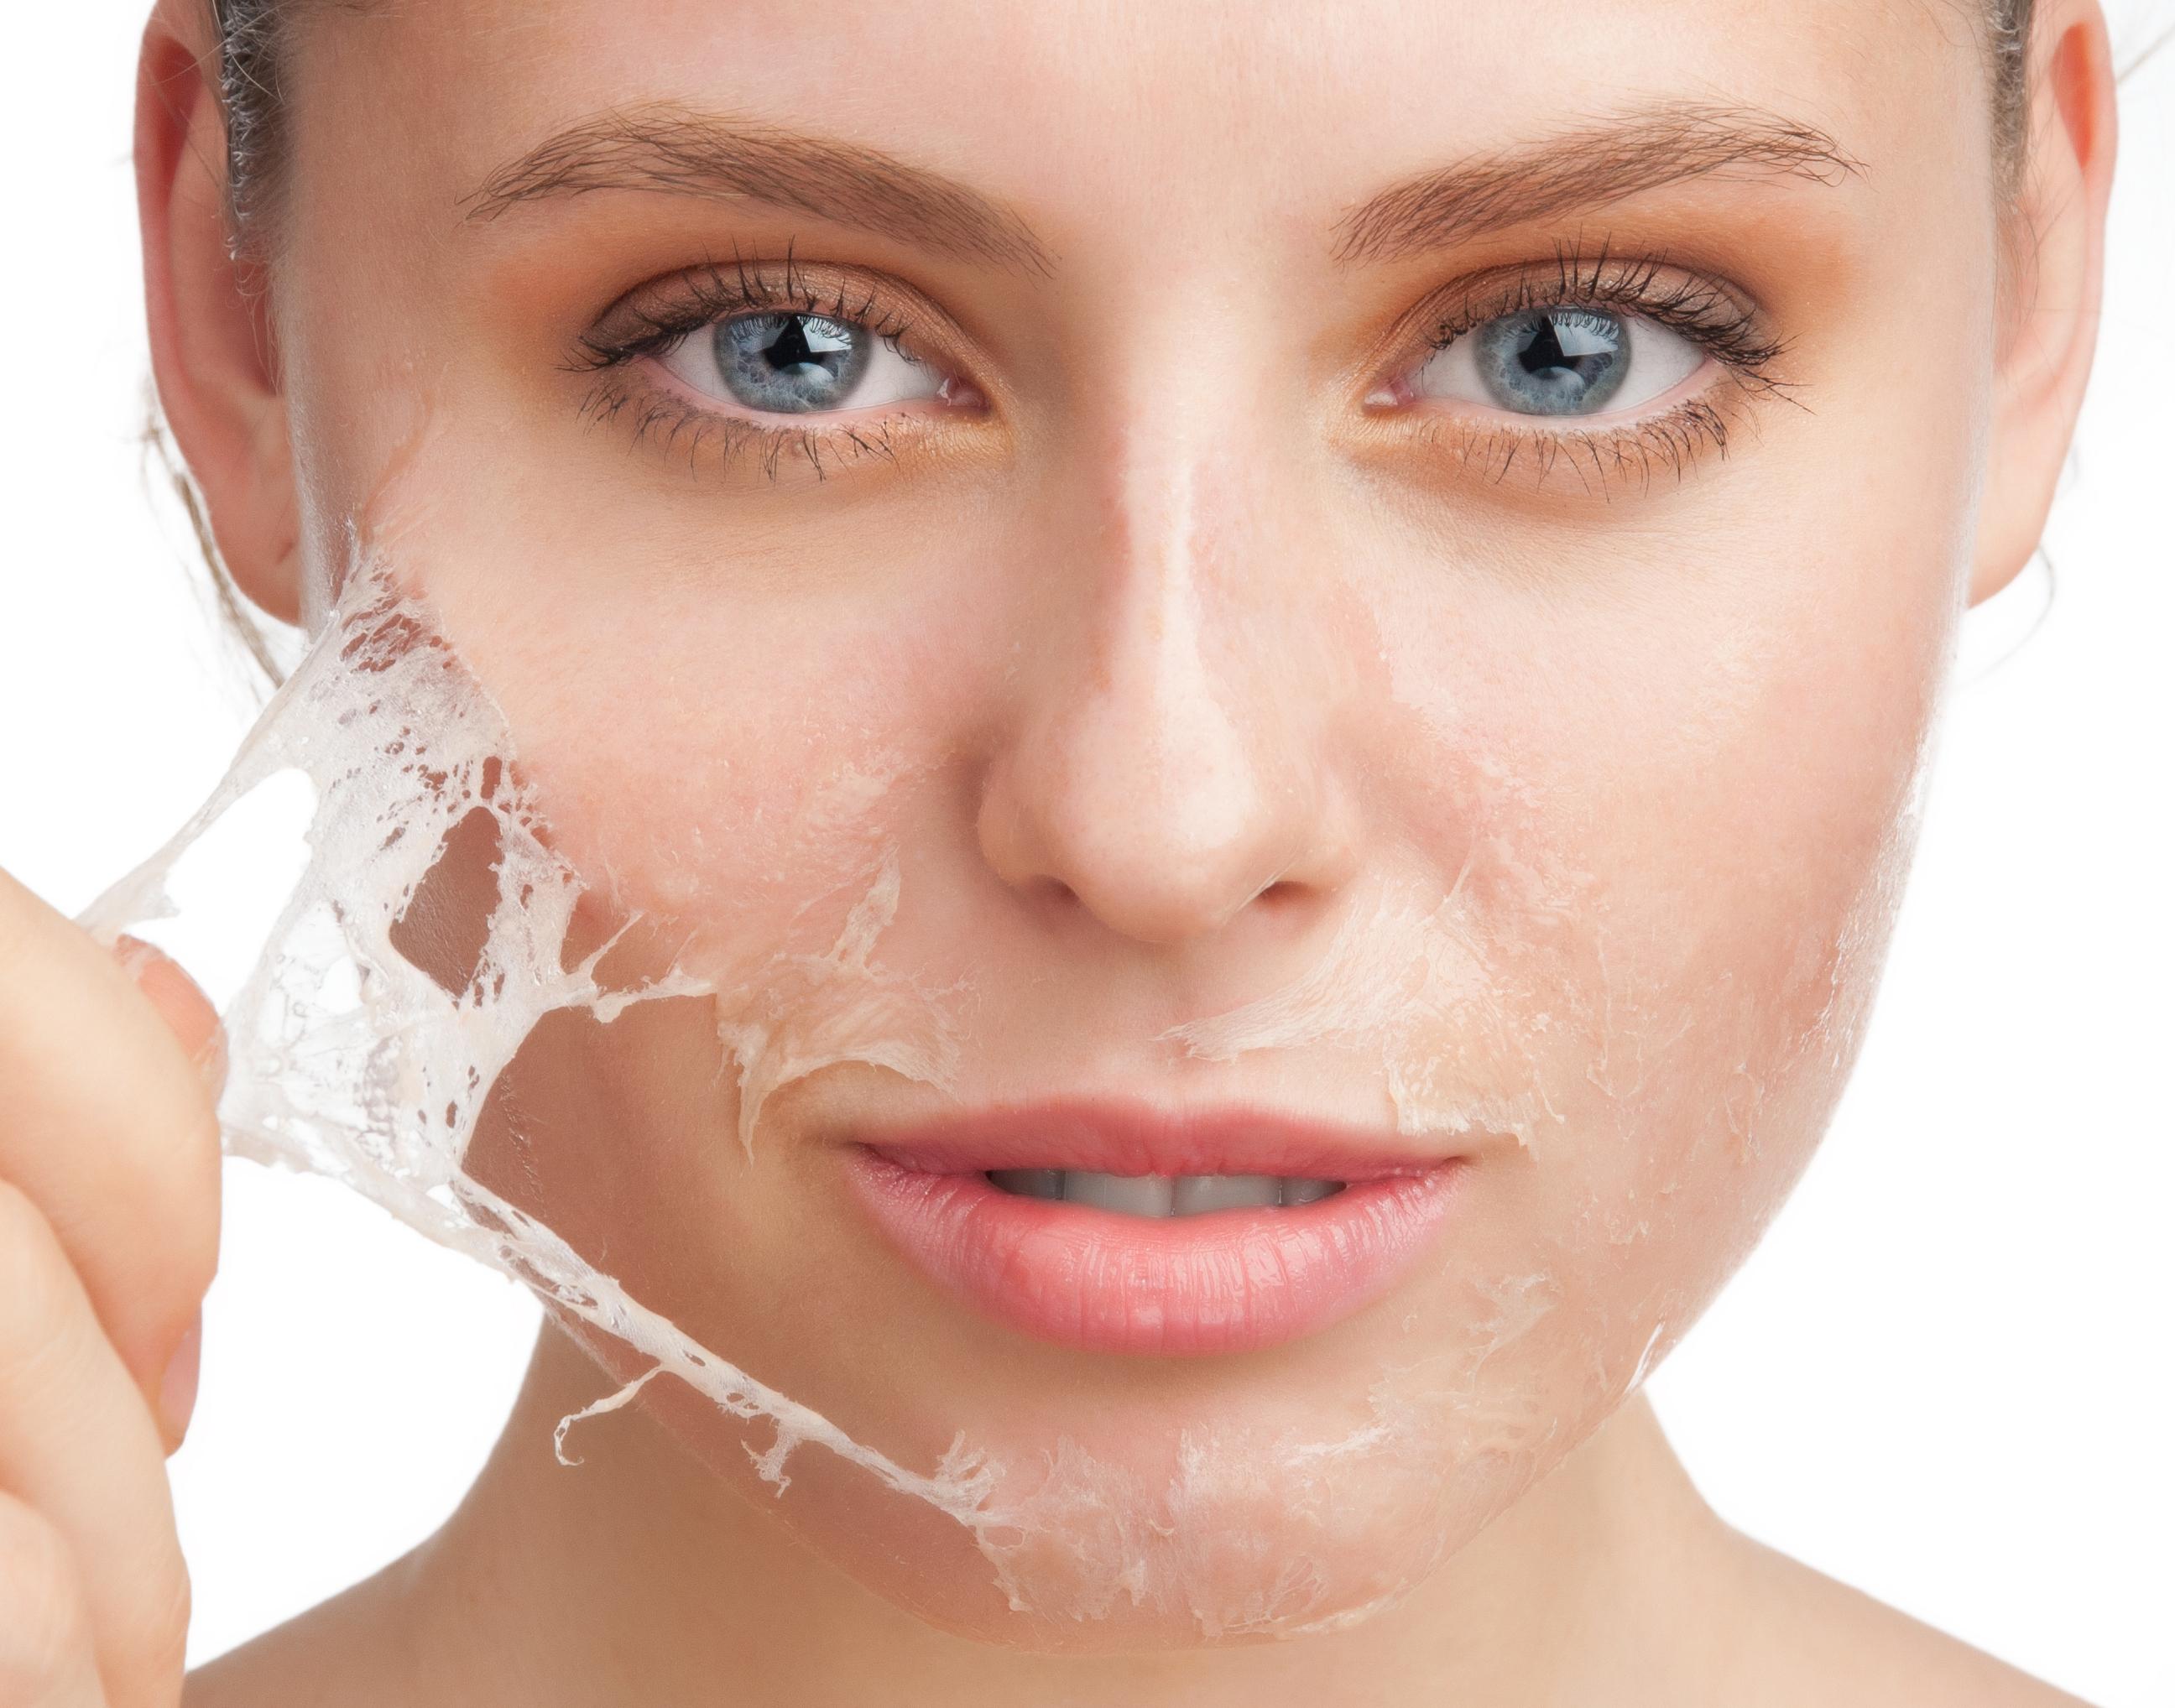 Myrrh-essential-oil-for-anti-ageing-skin